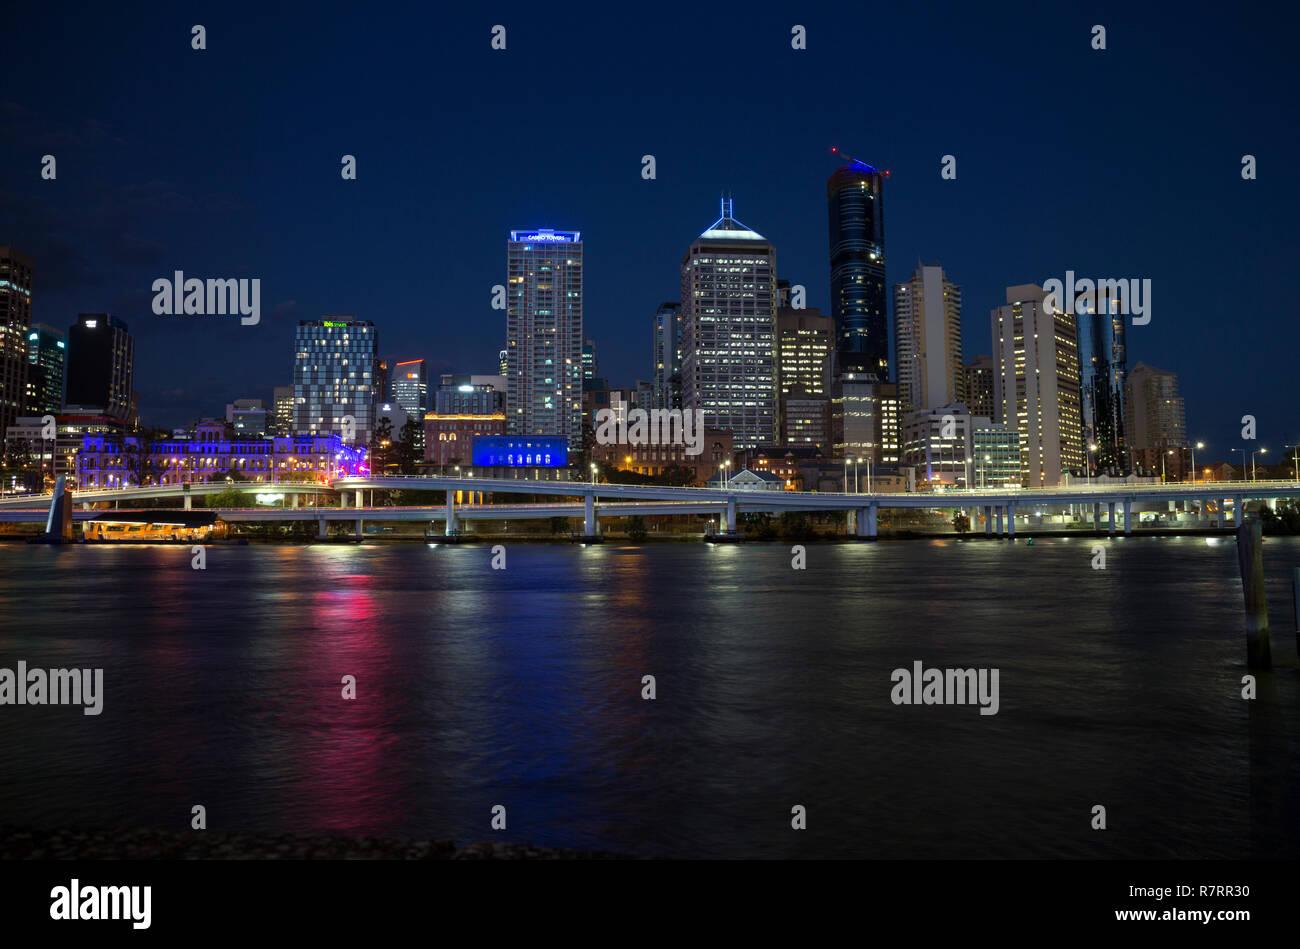 Brisbane city centre and Brisbane River at night, Queensland, Australia - Stock Image